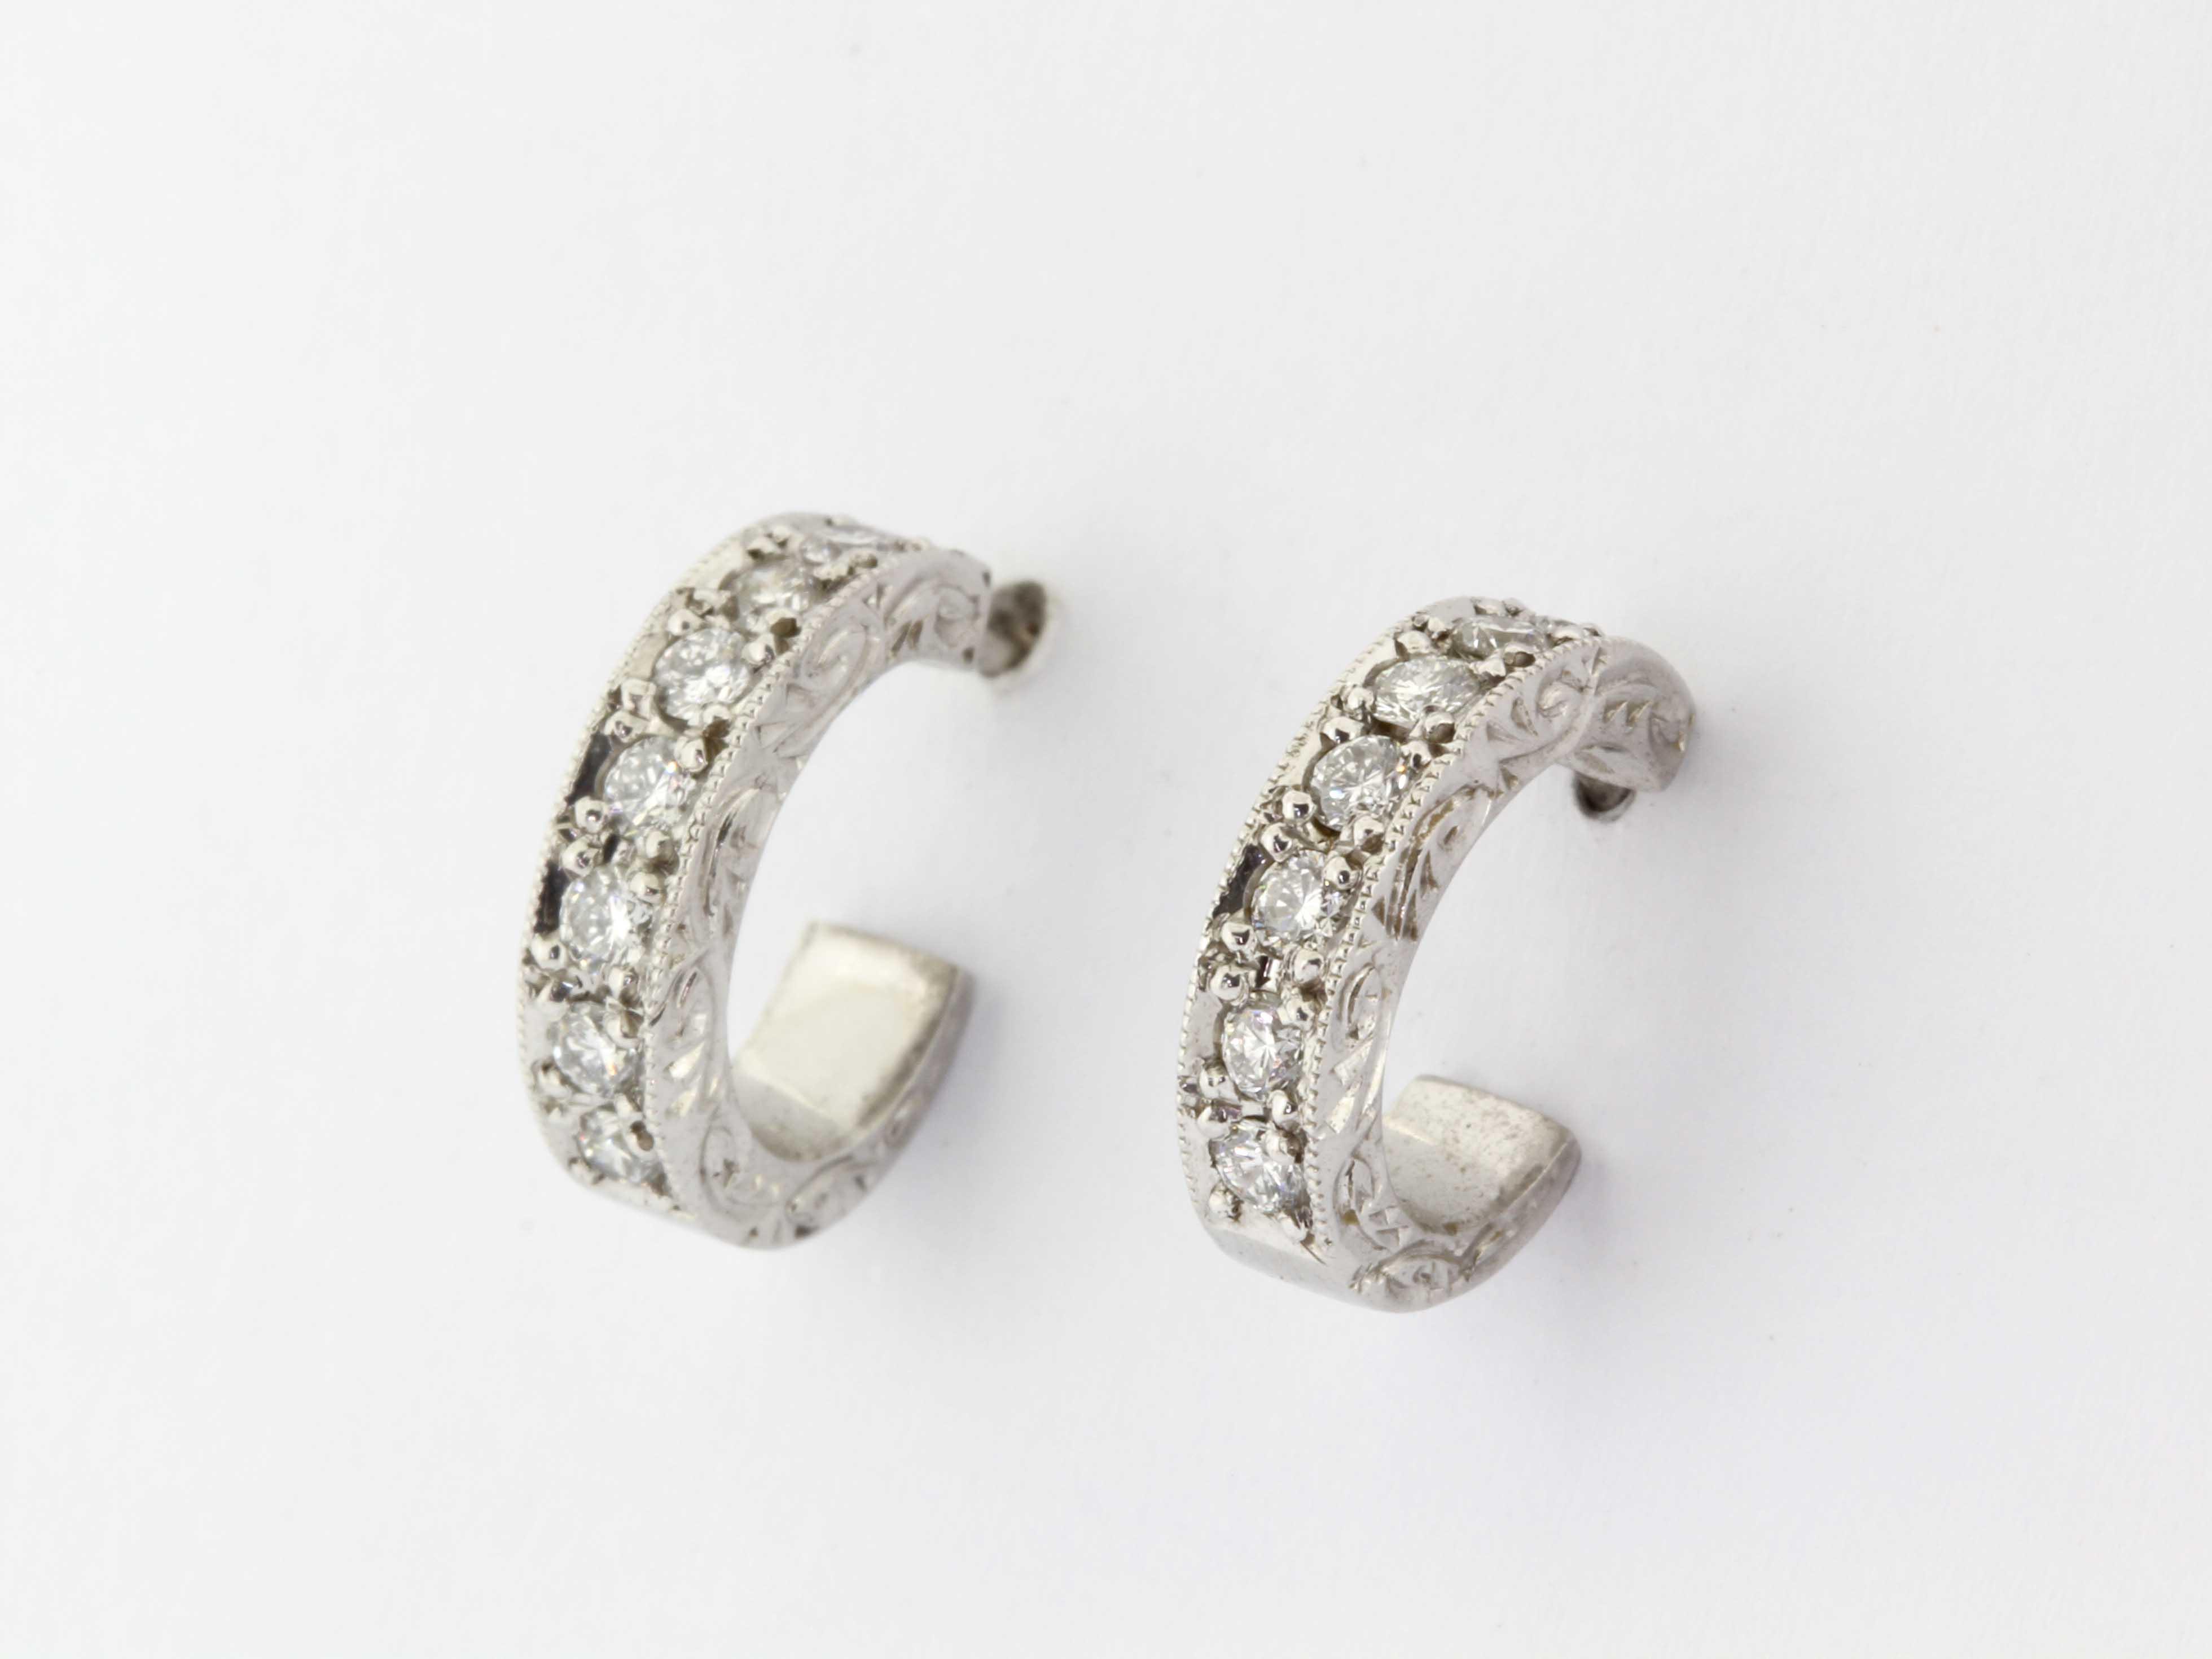 Earrings david batchelor jewellery catalogue -jeweller-jewellery-design-durban-portfolio